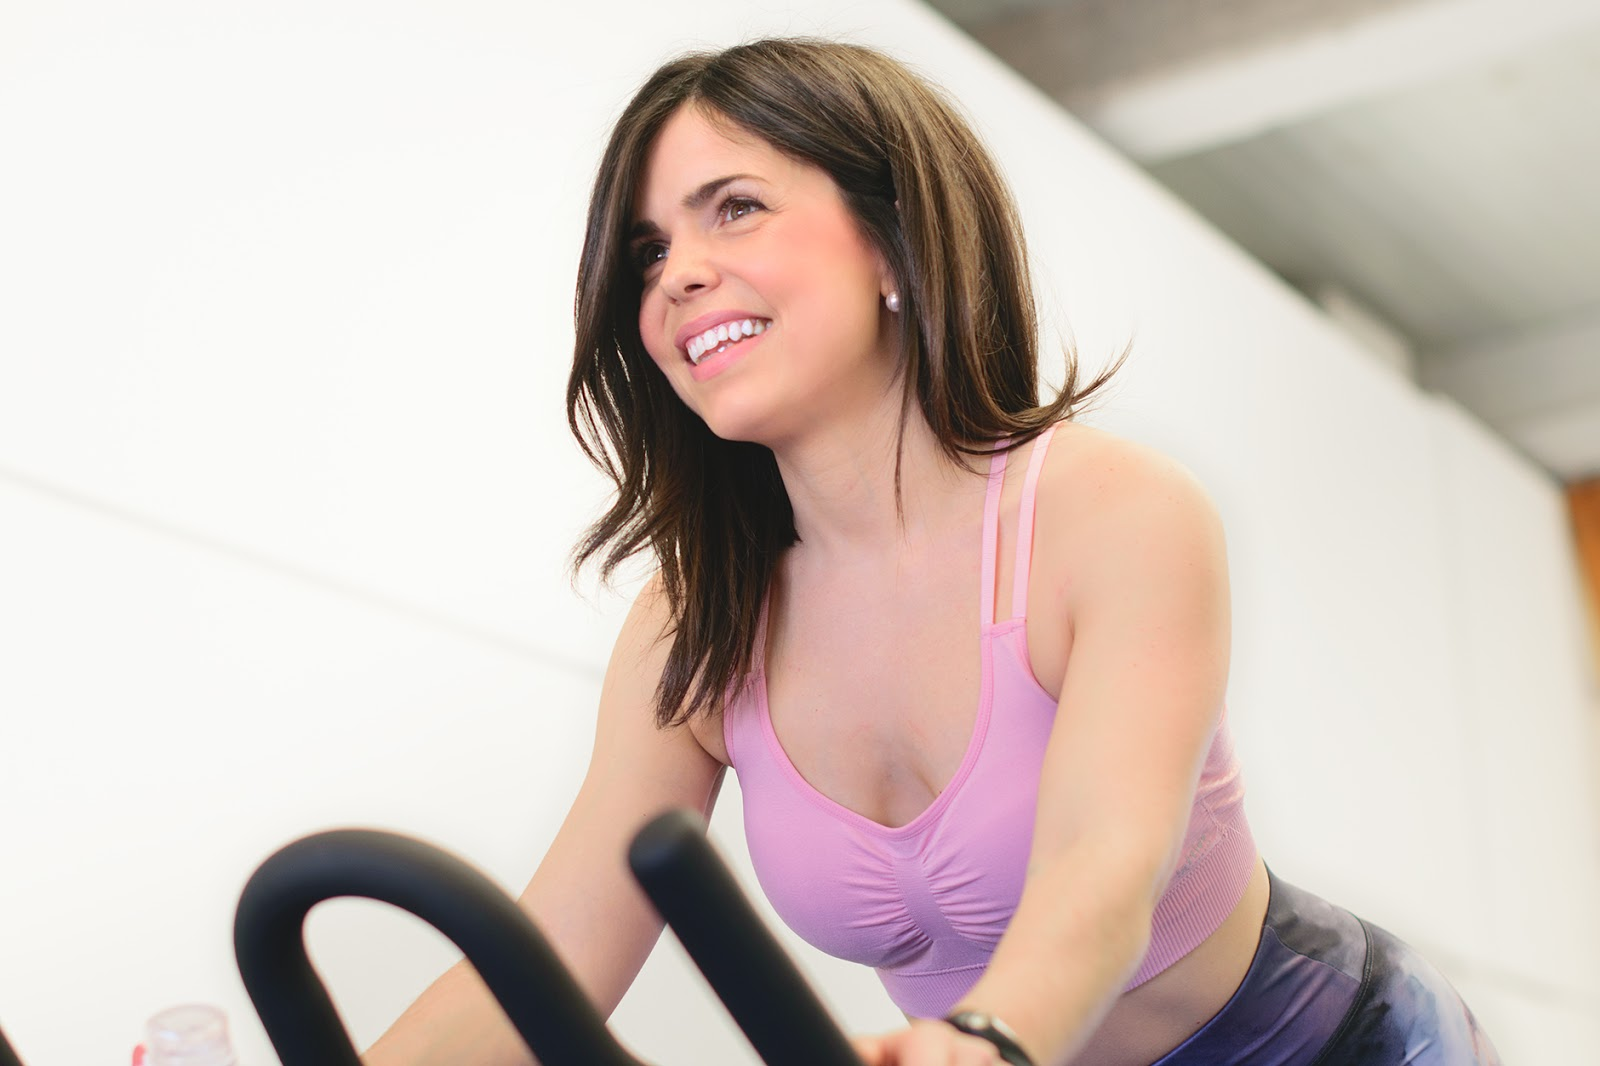 Ponteunostacones fitness